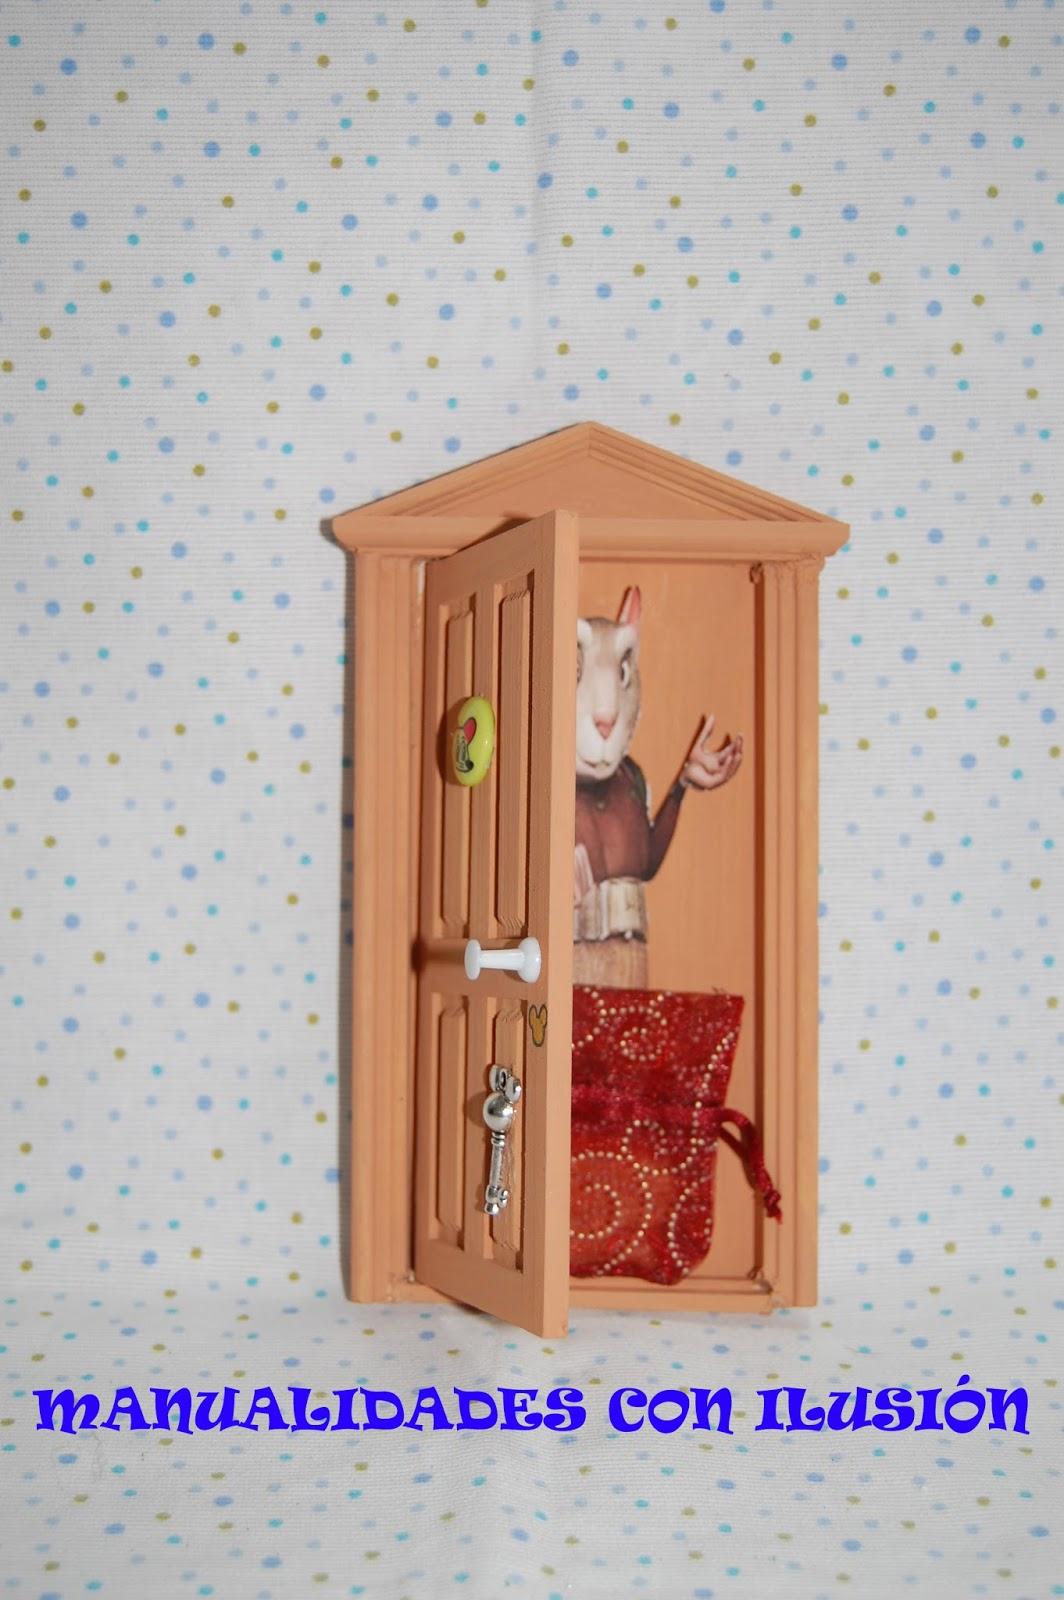 Manualidades con ilusion puerta ratoncito p rez for Puerta raton perez